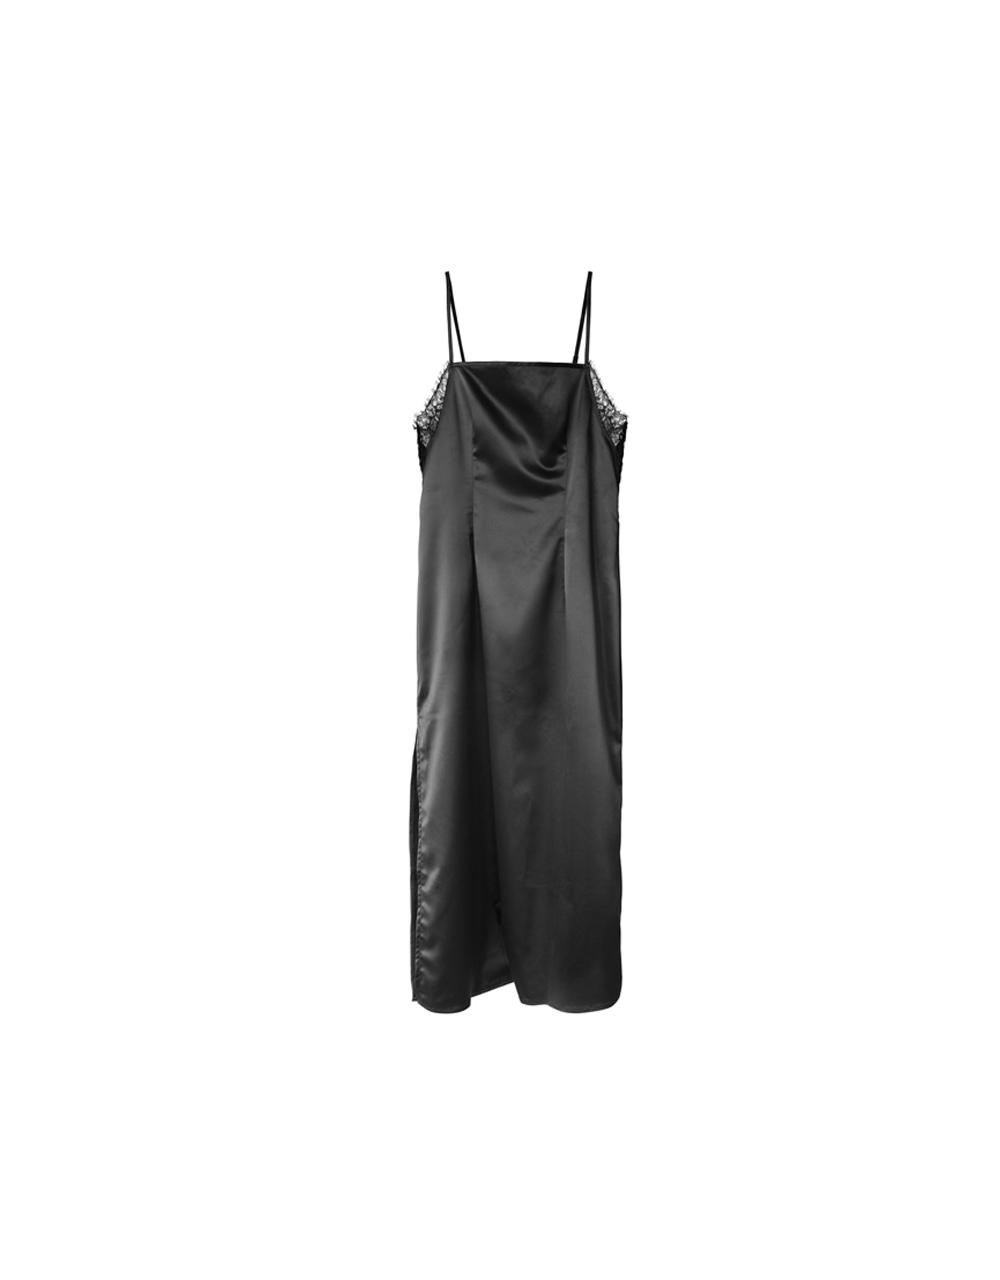 lingerie dress Charlie Black Storm 45 € Girls In Paris photo 6